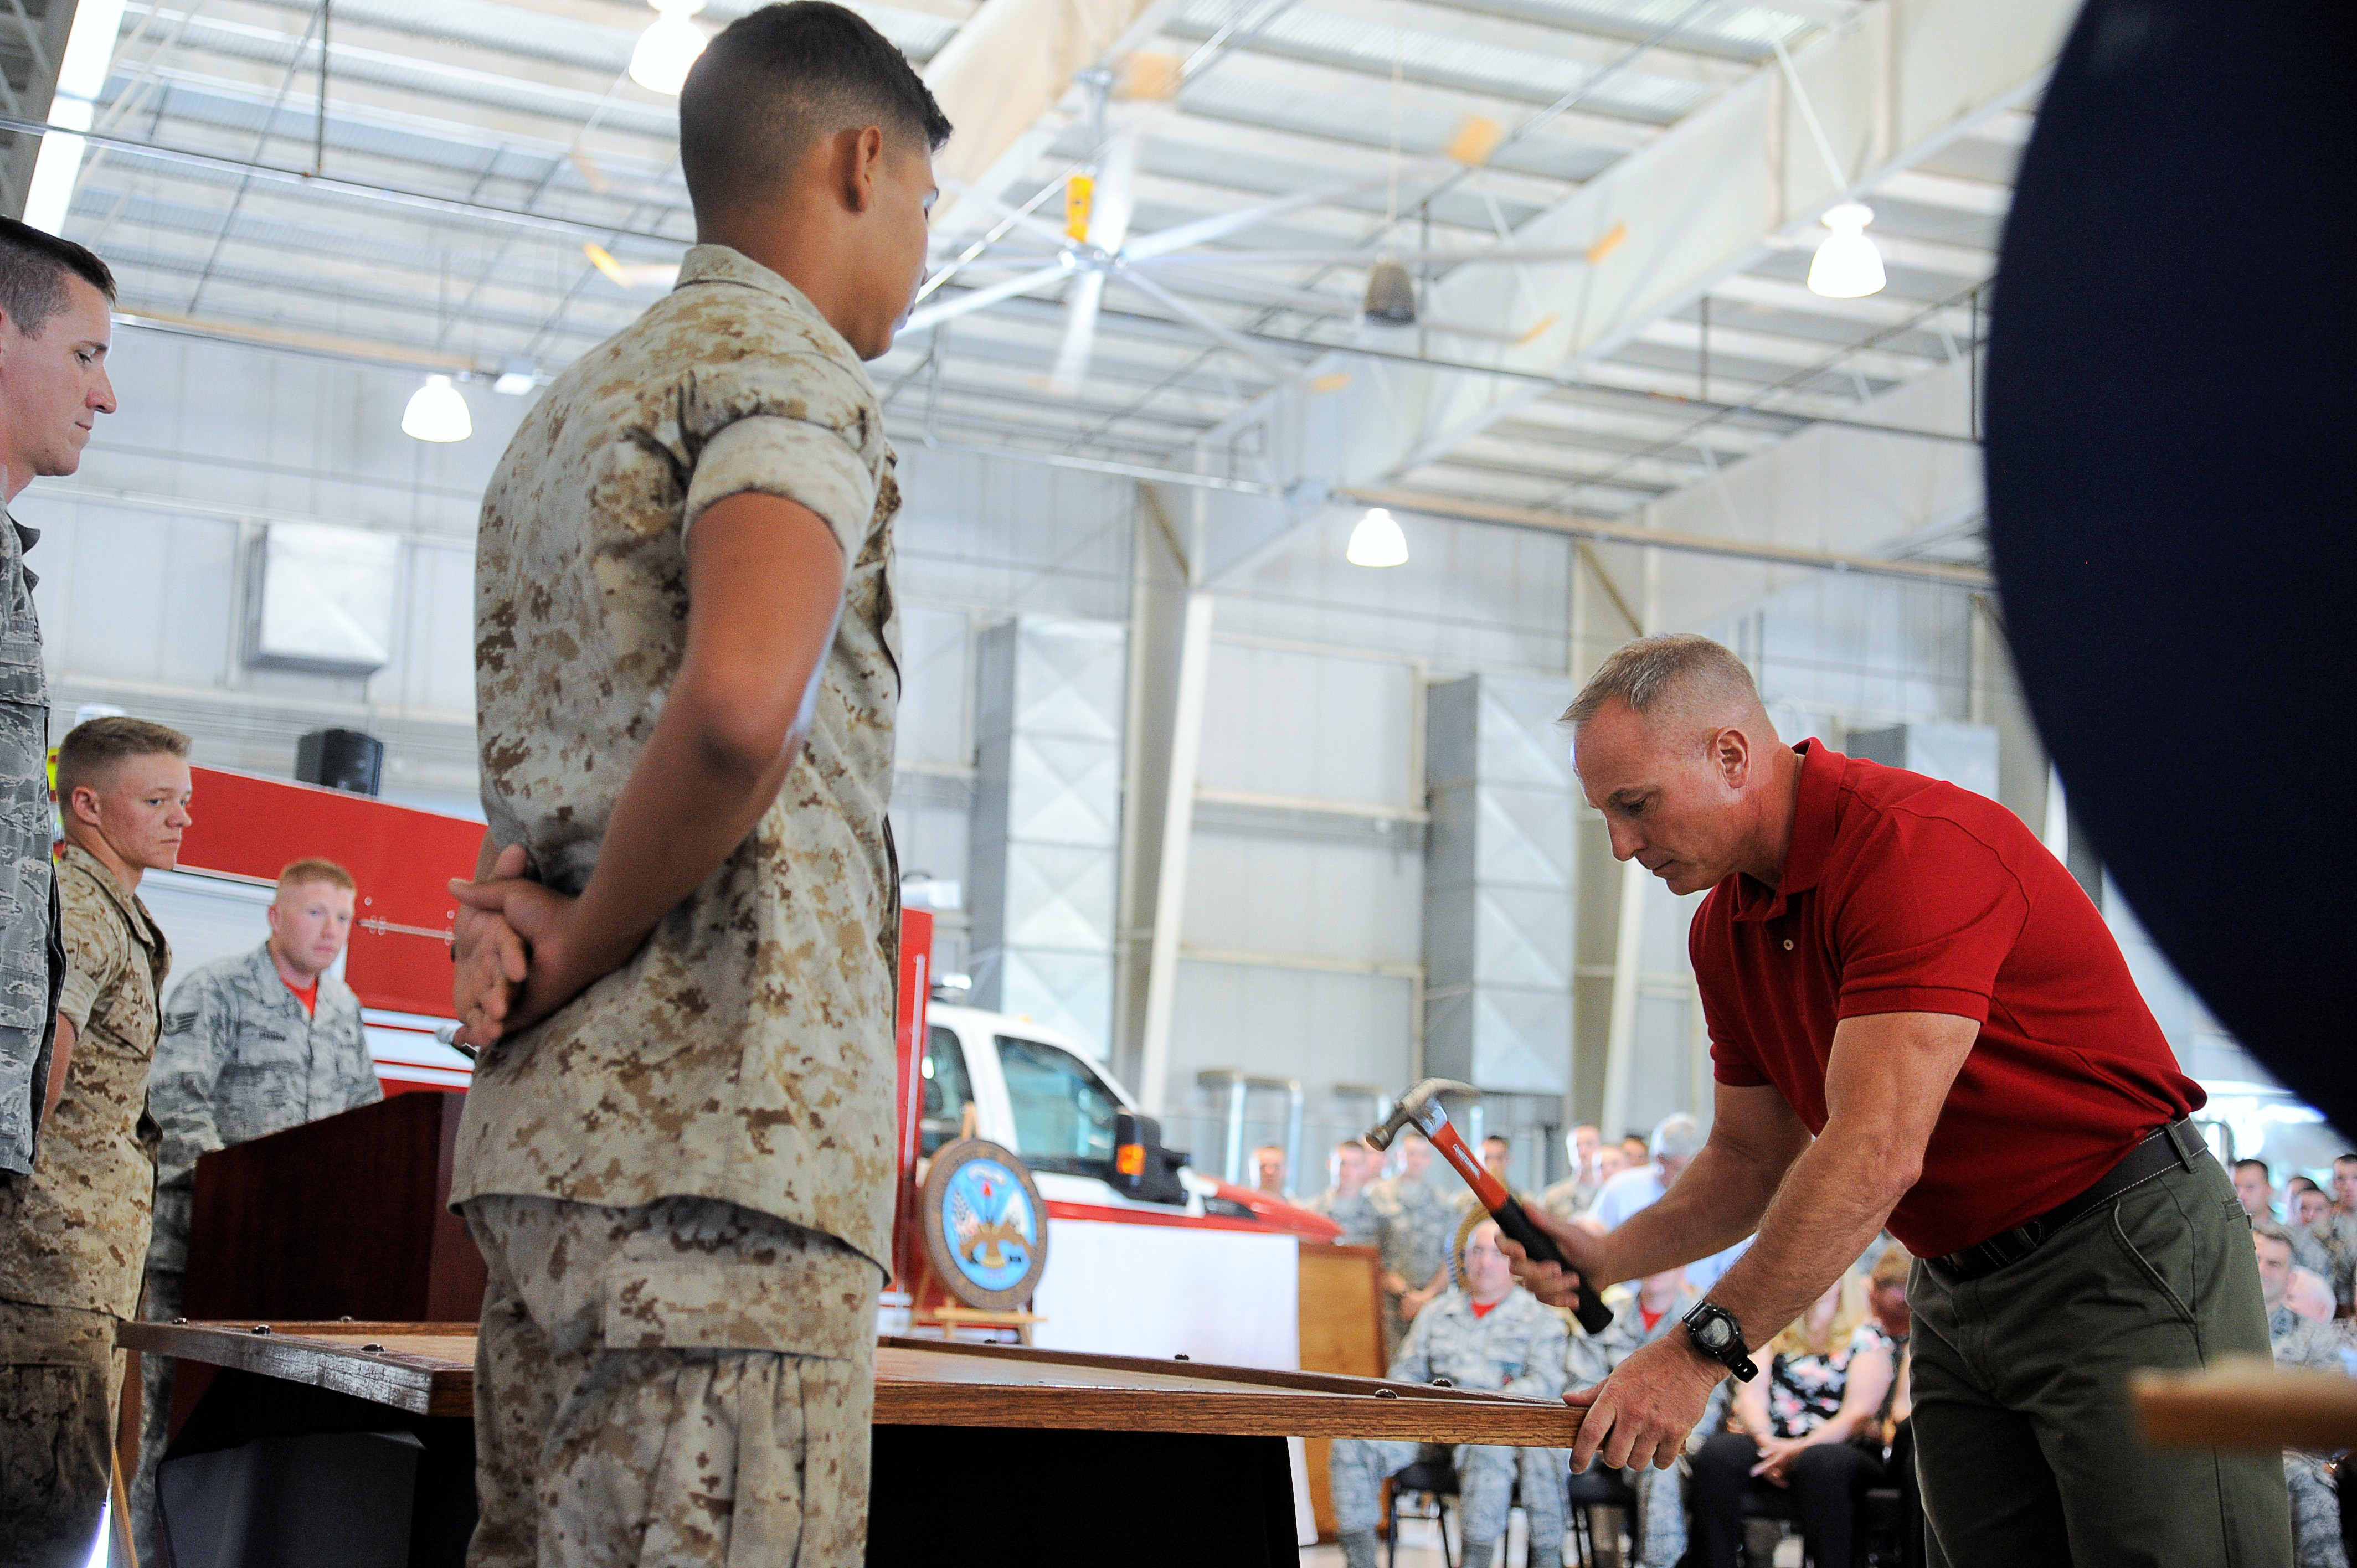 fire academy celebrates years of training > goodfellow air fire academy celebrates 20 years of training